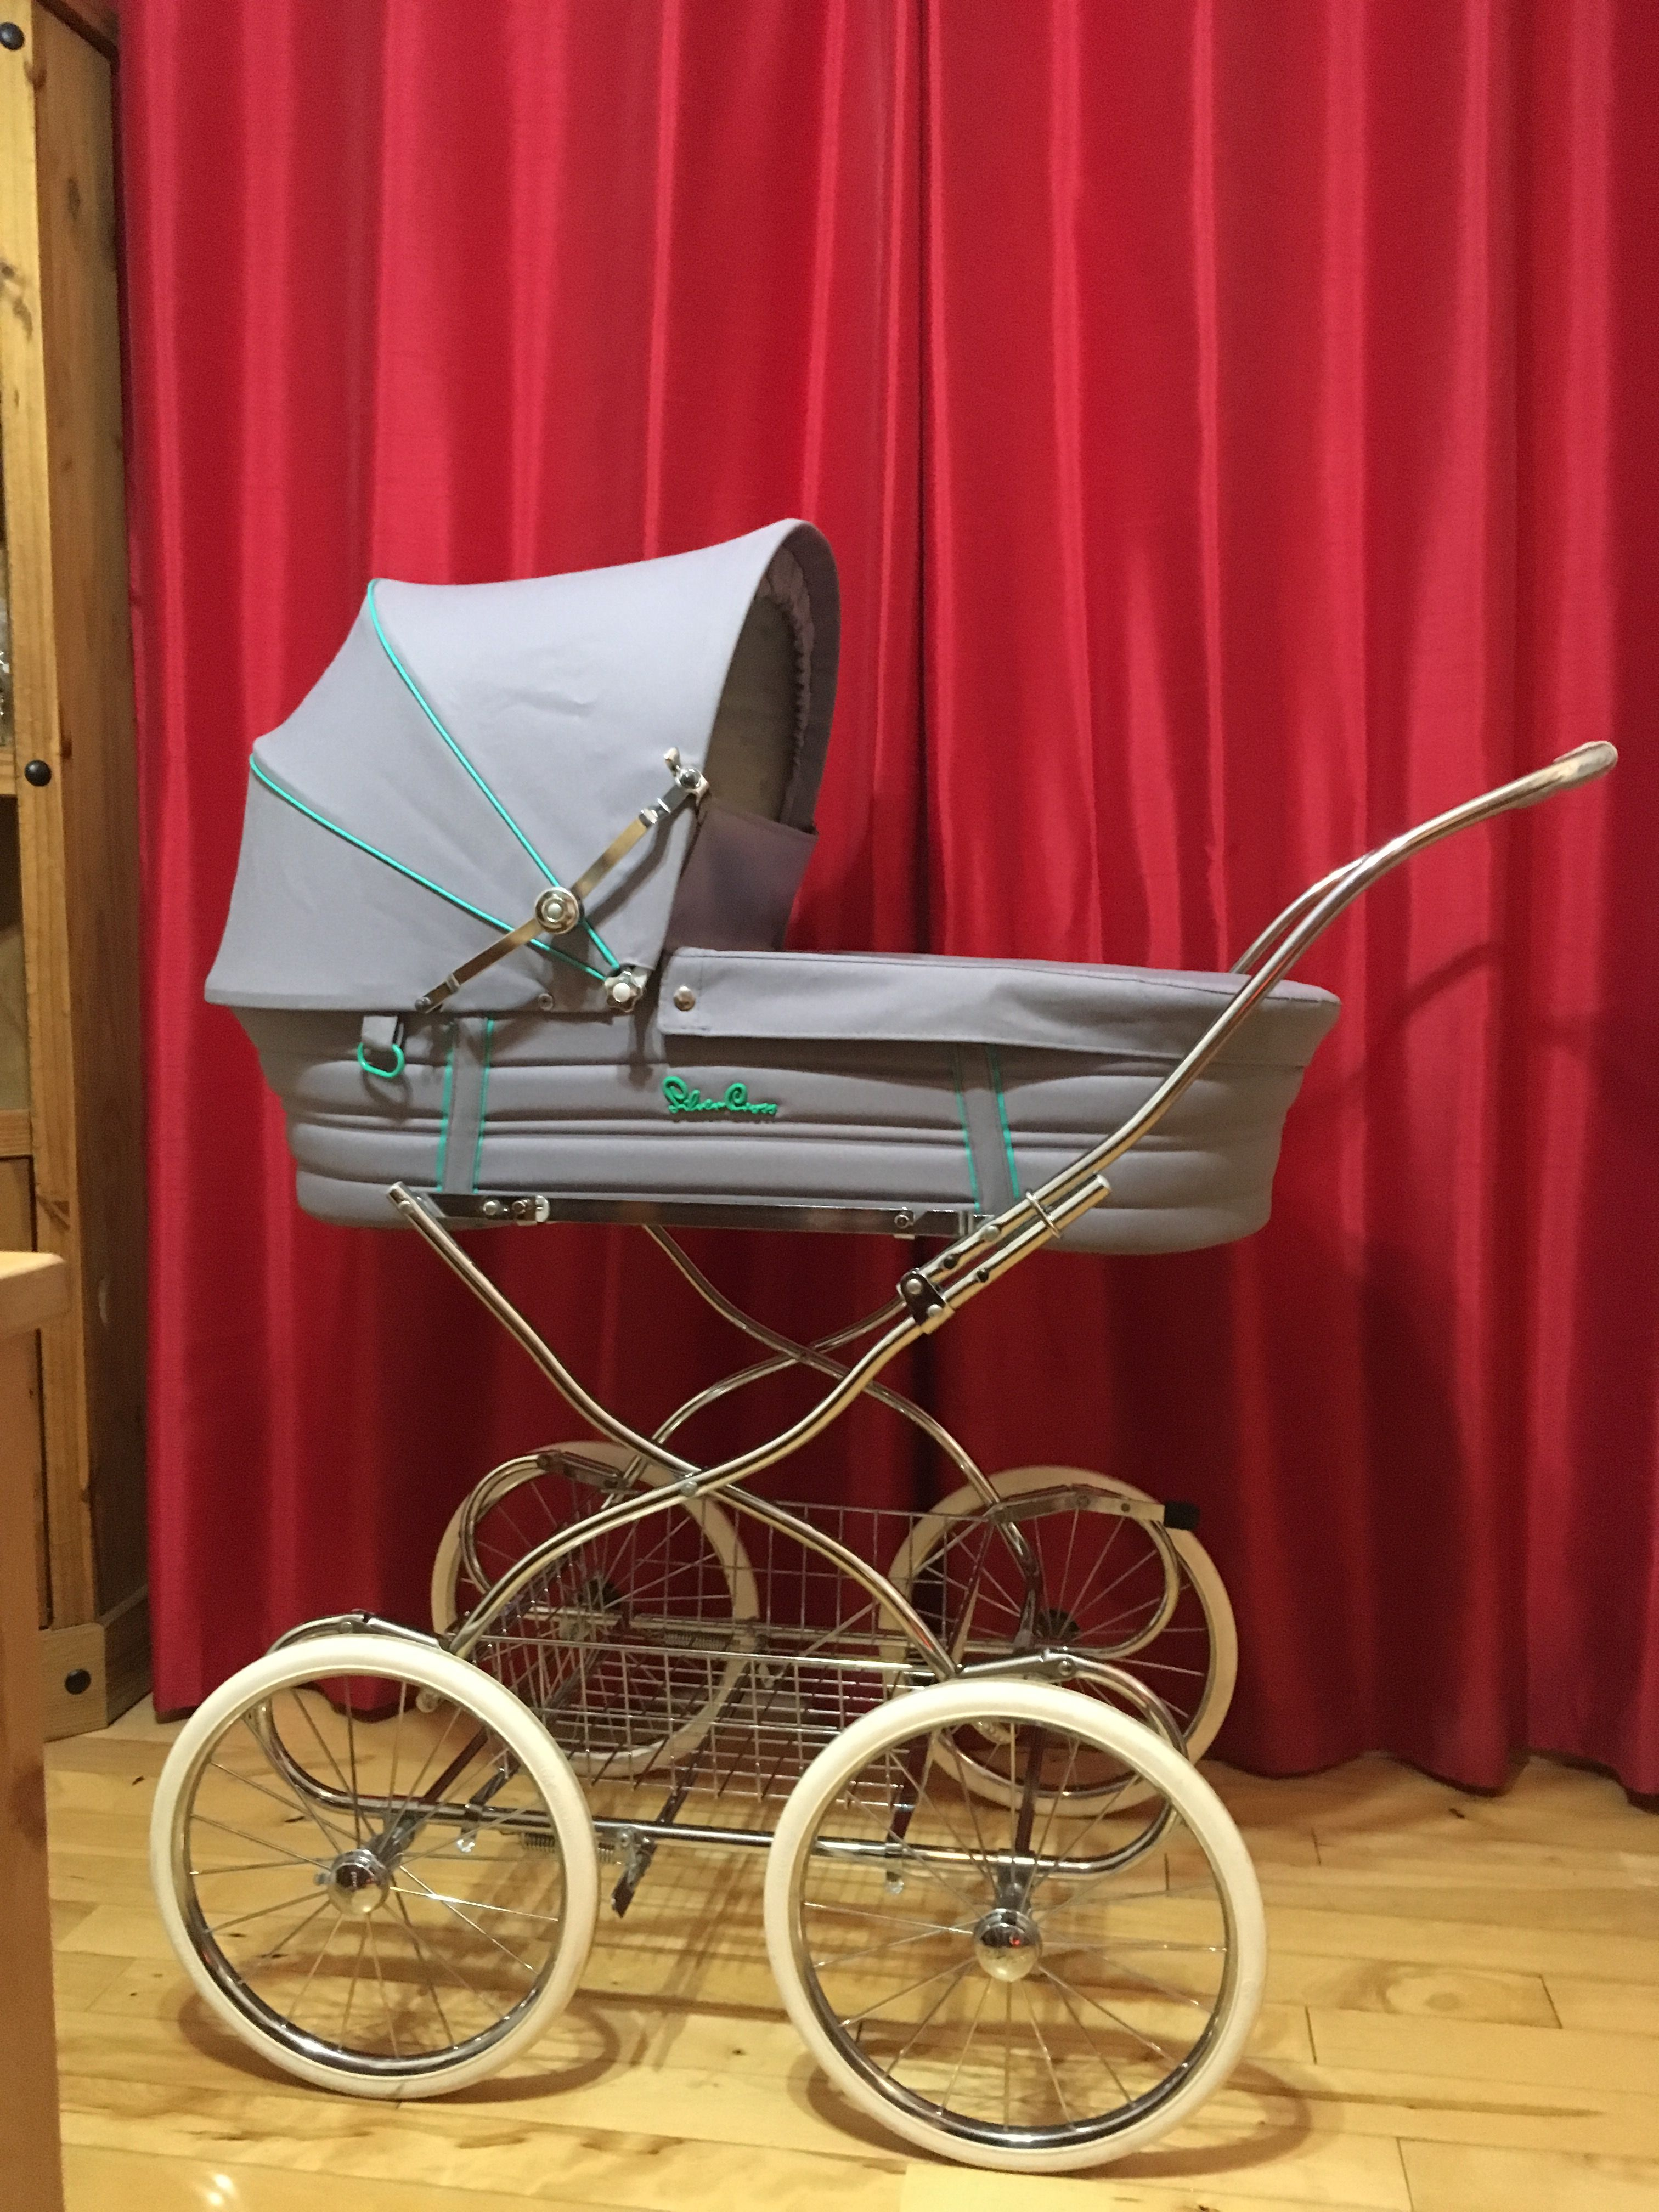 Vintage Silvercross Chancellor £50 Stroller, Vintage pram